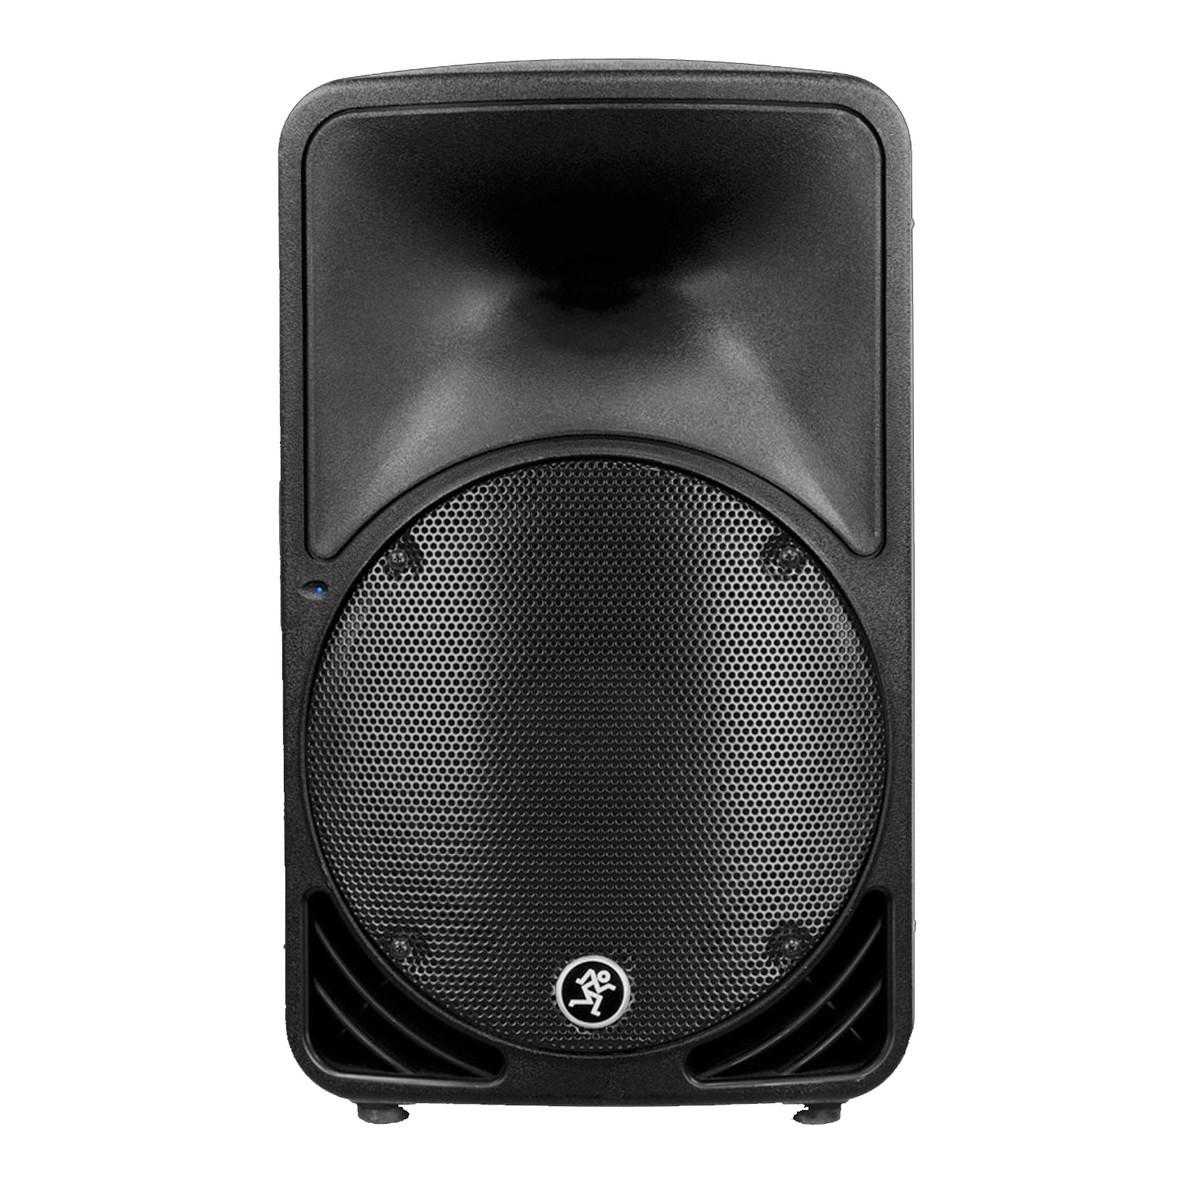 mackie c200 10 passive pa speaker at gear4music. Black Bedroom Furniture Sets. Home Design Ideas